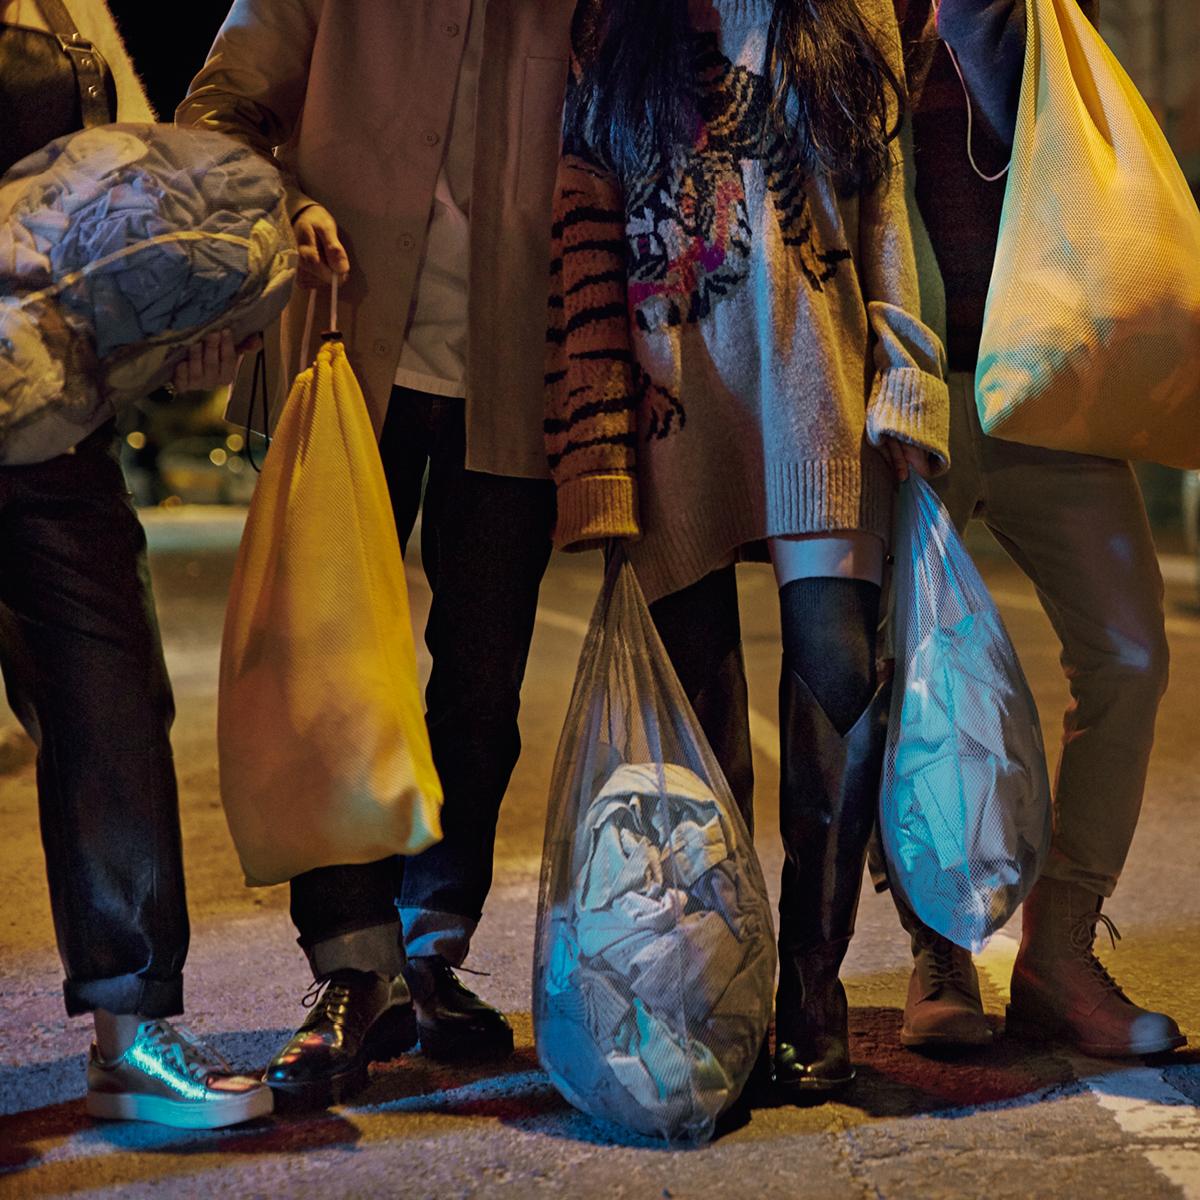 H&M-Garment-Collecting-Box-Don't-let-fashion-go-to-waste-reciclare-haine-voucher-cumparaturi